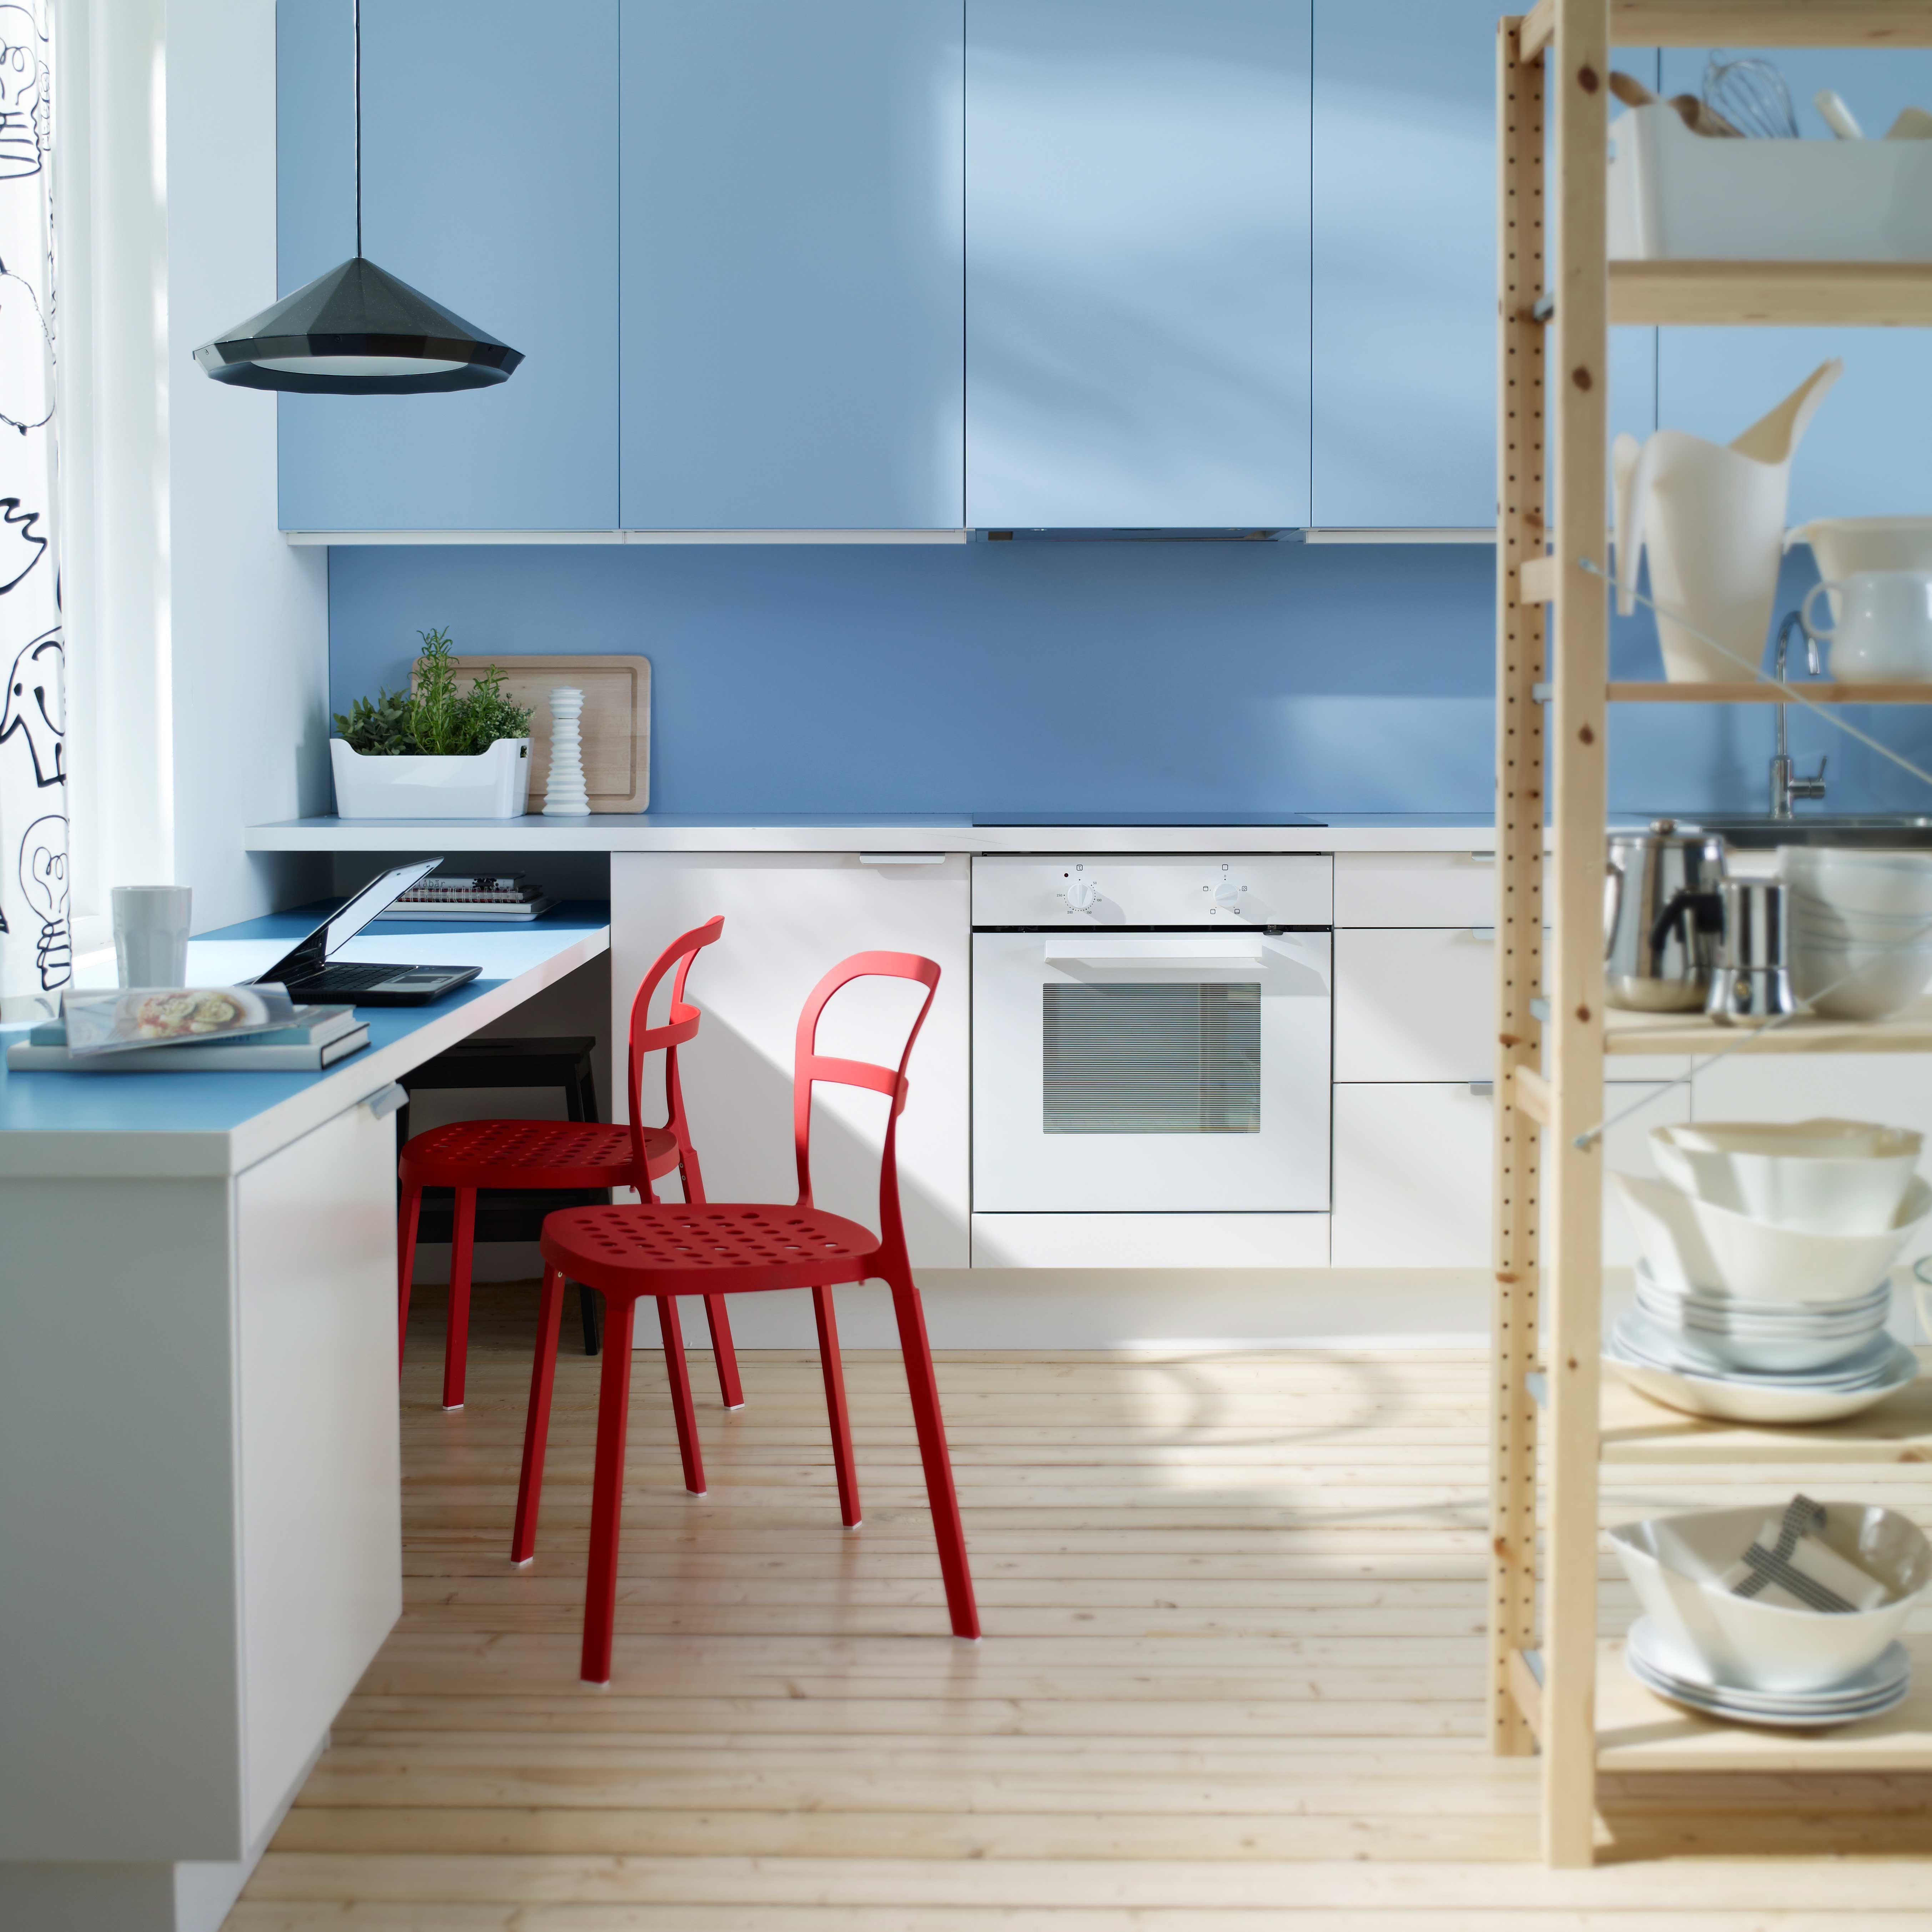 ikea k che blau k che l form ikea beste blaue farbe schlafzimmer buiducliem. Black Bedroom Furniture Sets. Home Design Ideas